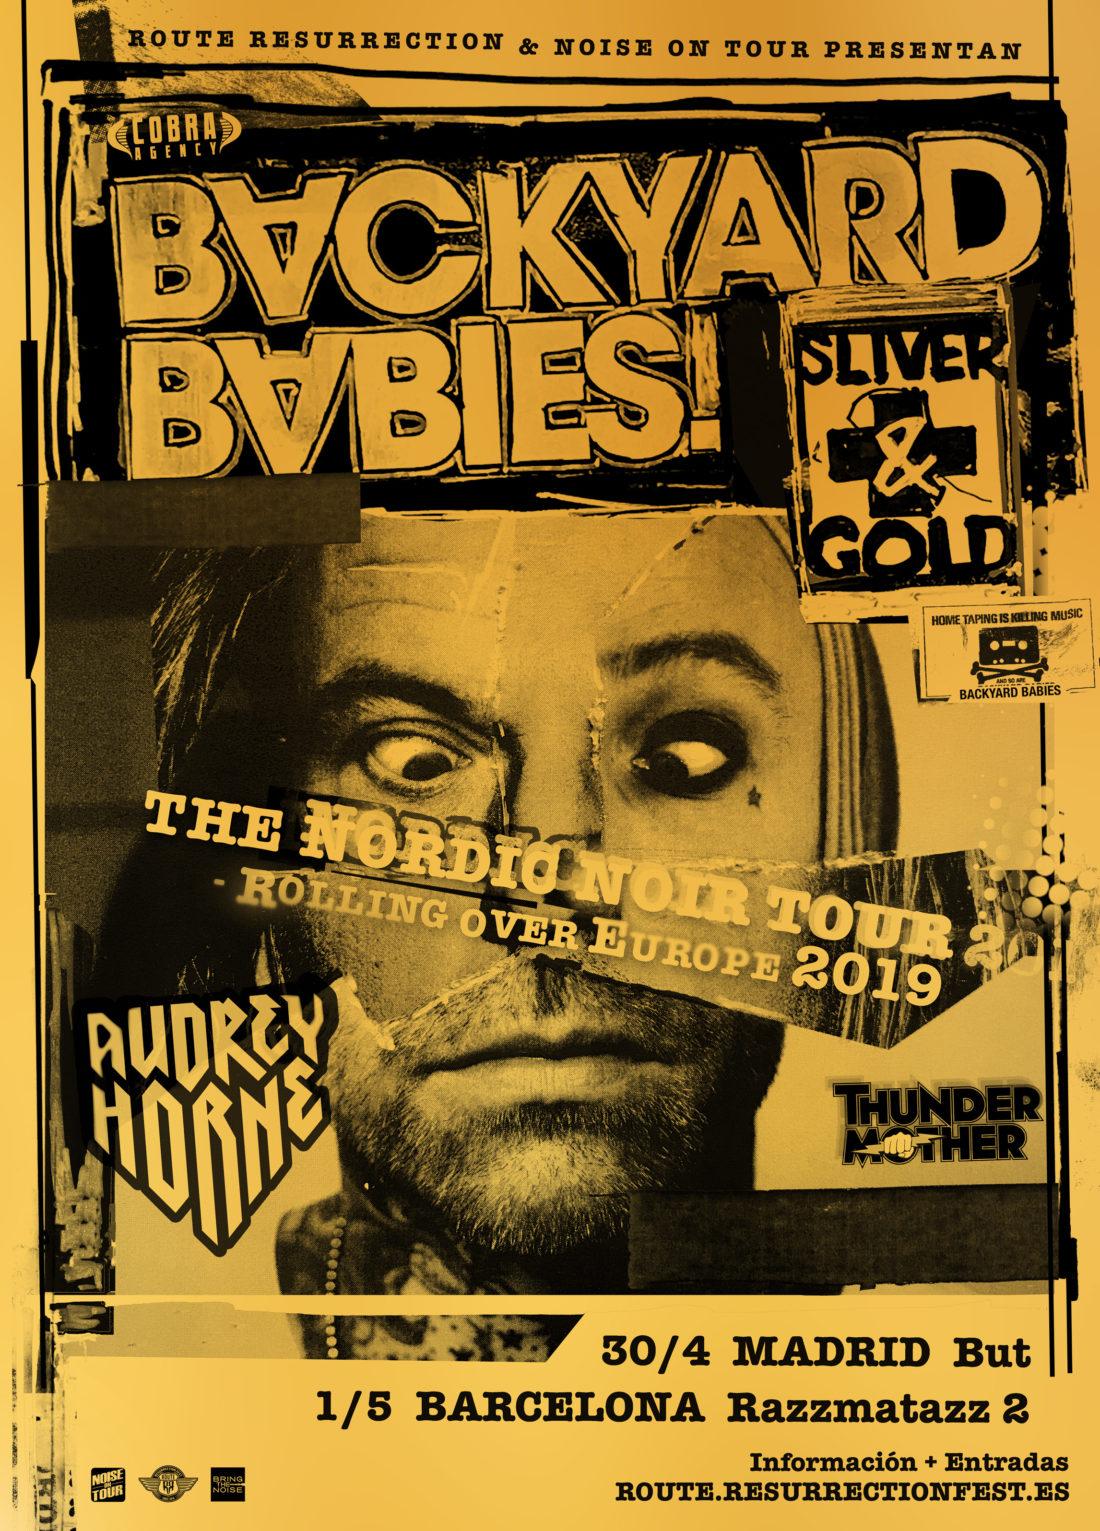 Nueva gira Route Resurrection: Backyard Babies